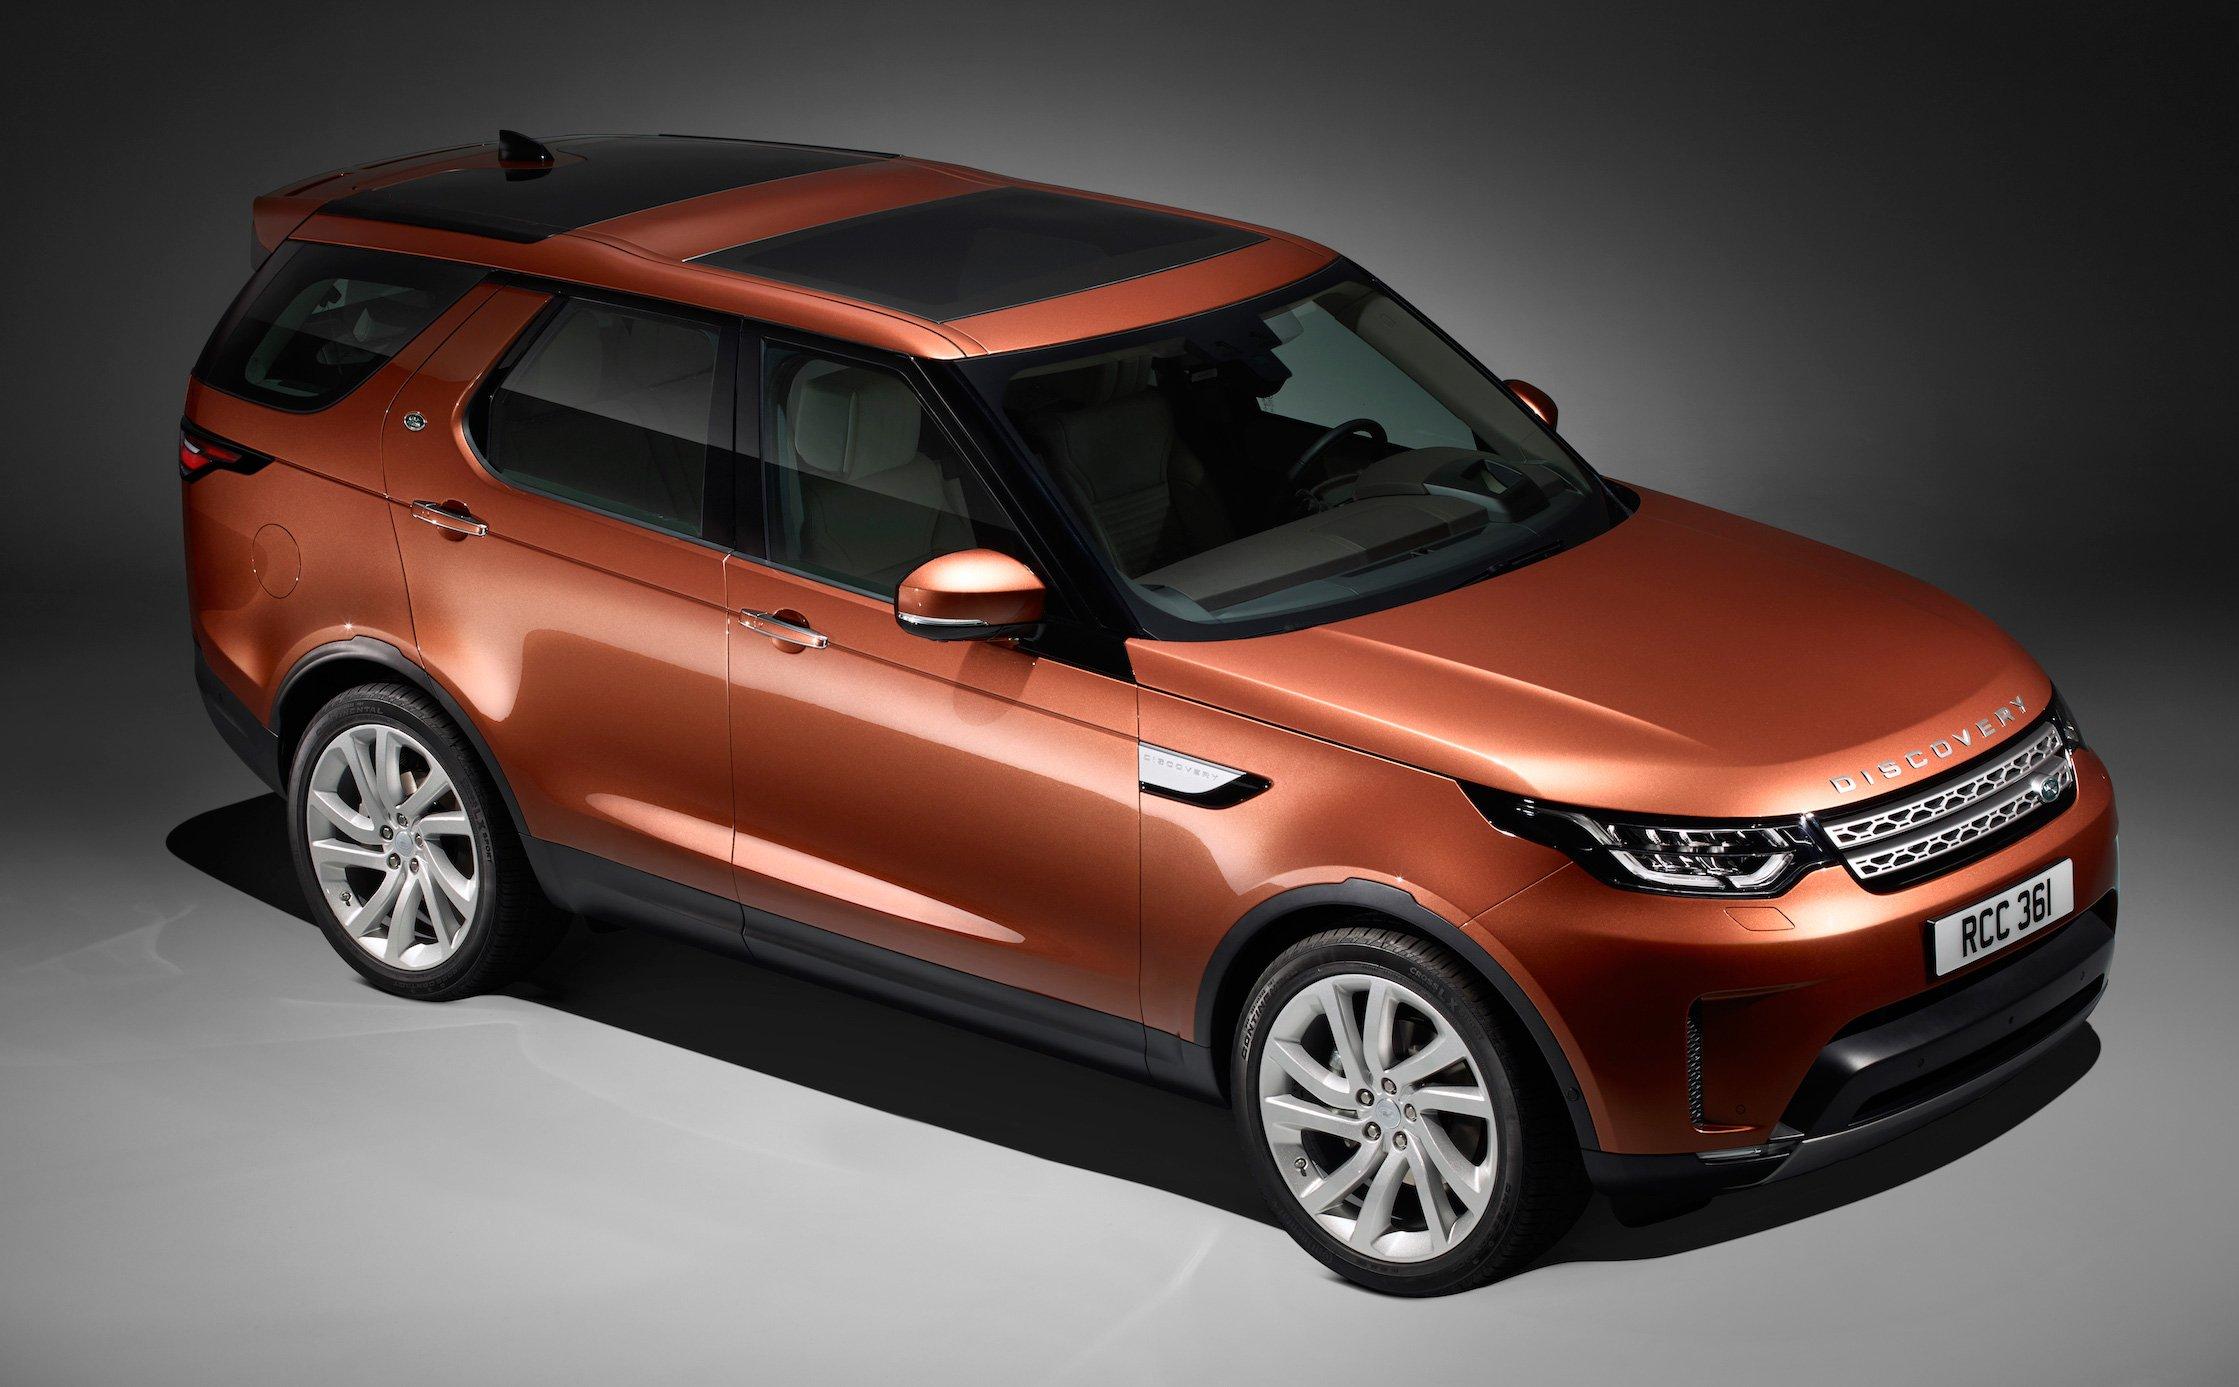 new land rover discovery full 7 seater 480 kg lighter image 555585. Black Bedroom Furniture Sets. Home Design Ideas